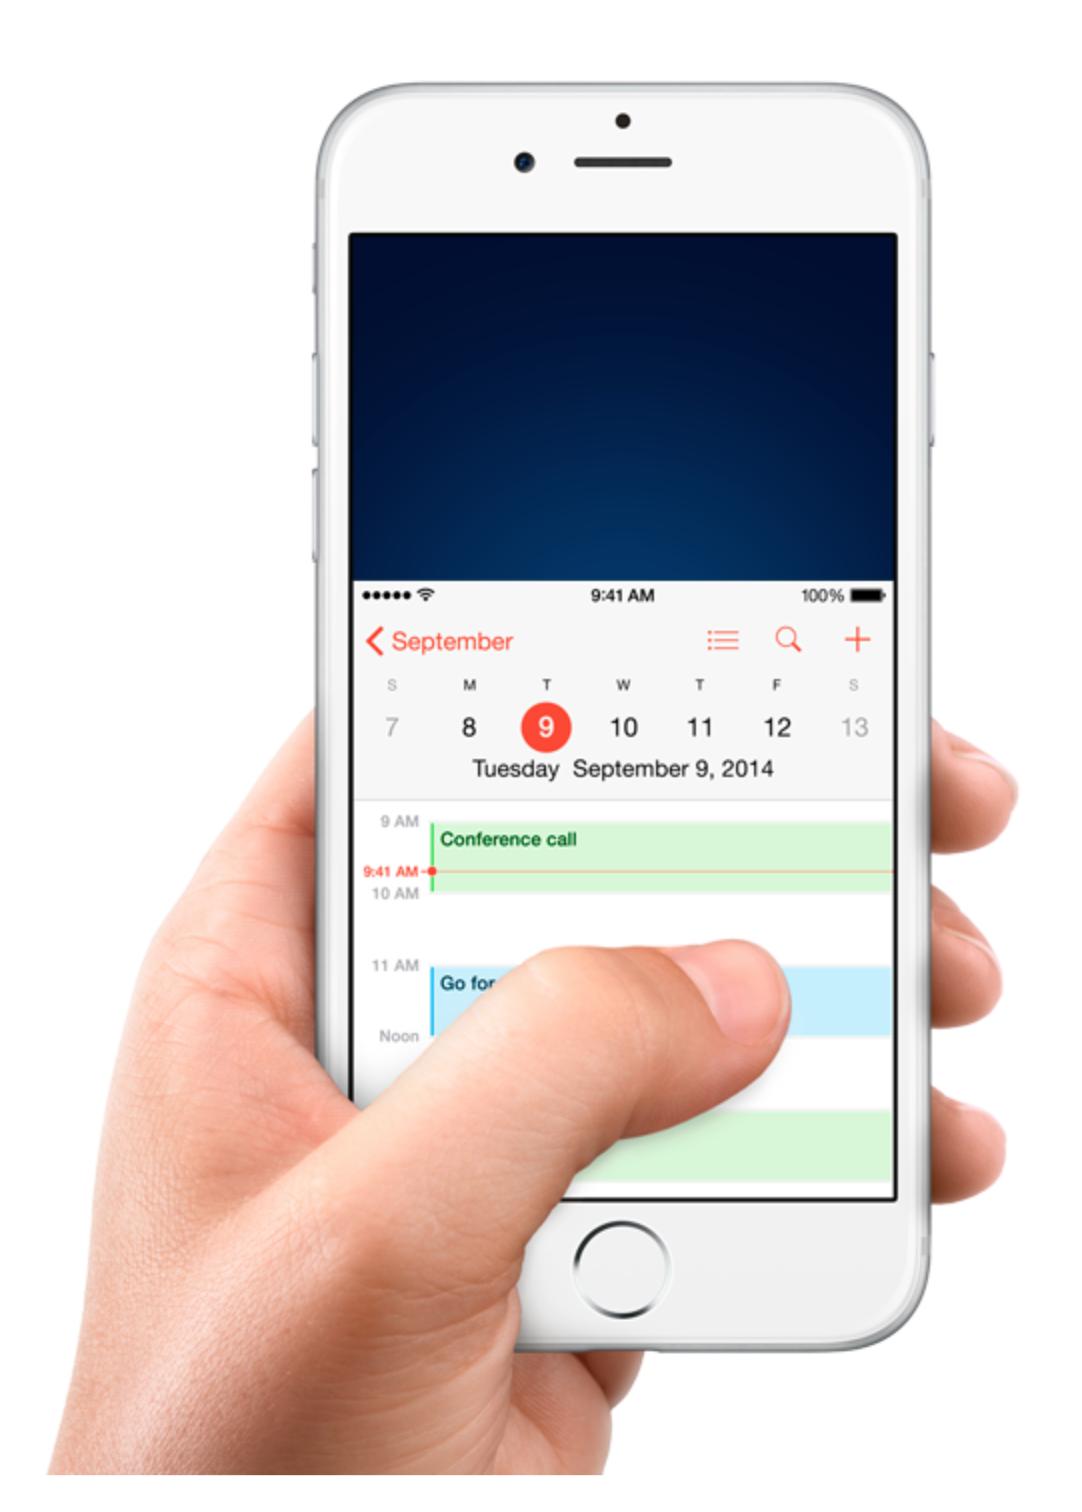 3. Reachability at iOS8 by Apple